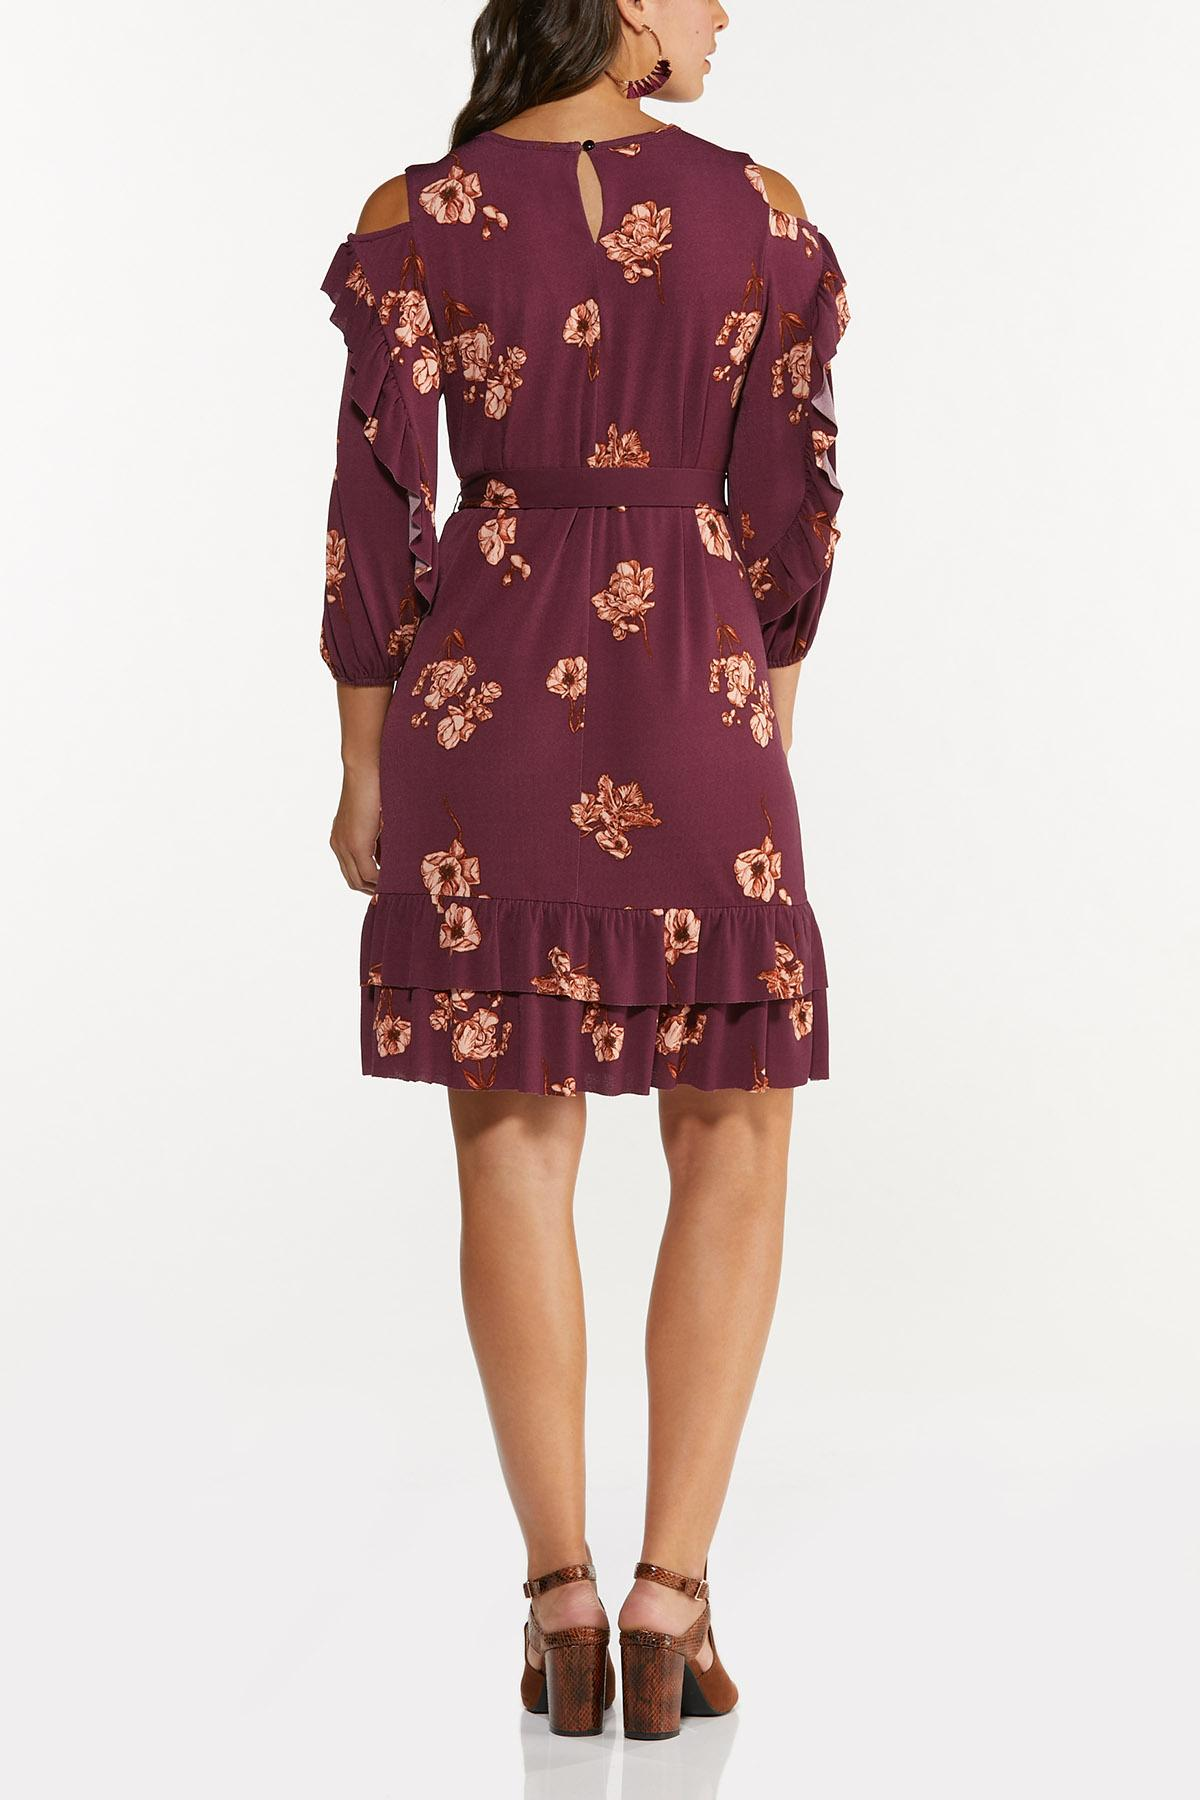 Flounced Floral Dress (Item #44678666)